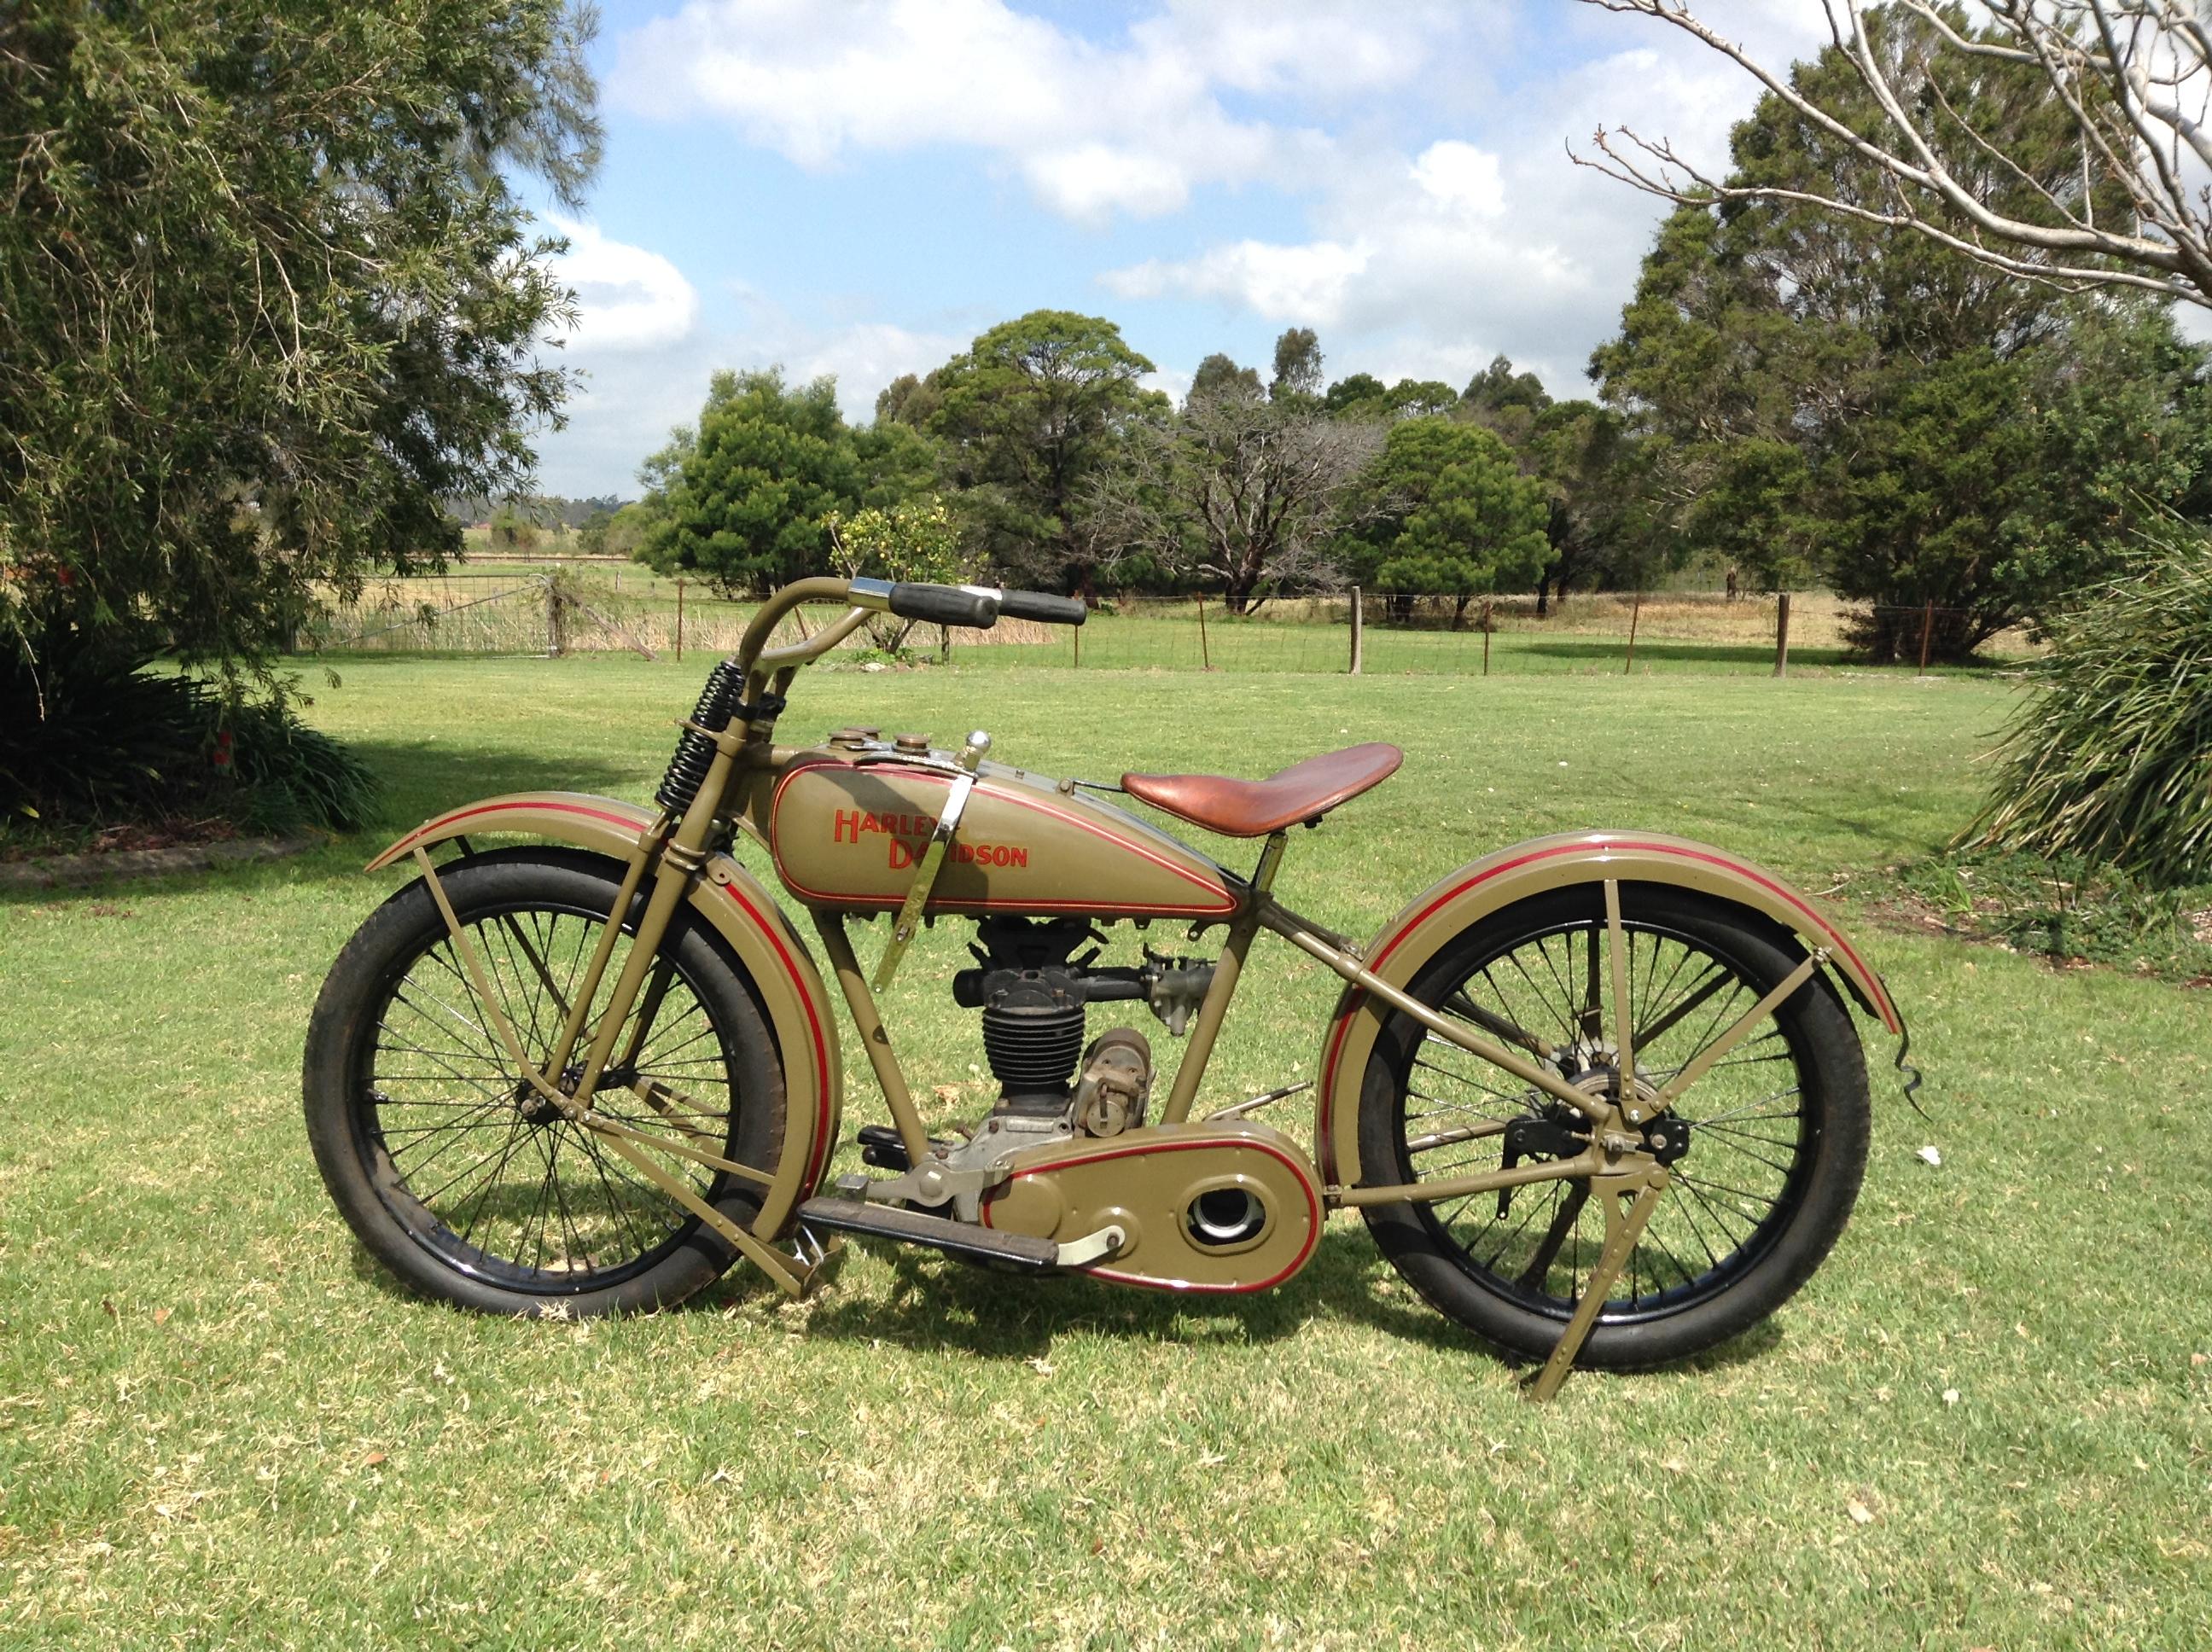 Oldmotodude 1928 Harley Davidson Ohv Peashooter For Sale: 1926 Harley Davidson OHV 'Peashooter' – SOLD